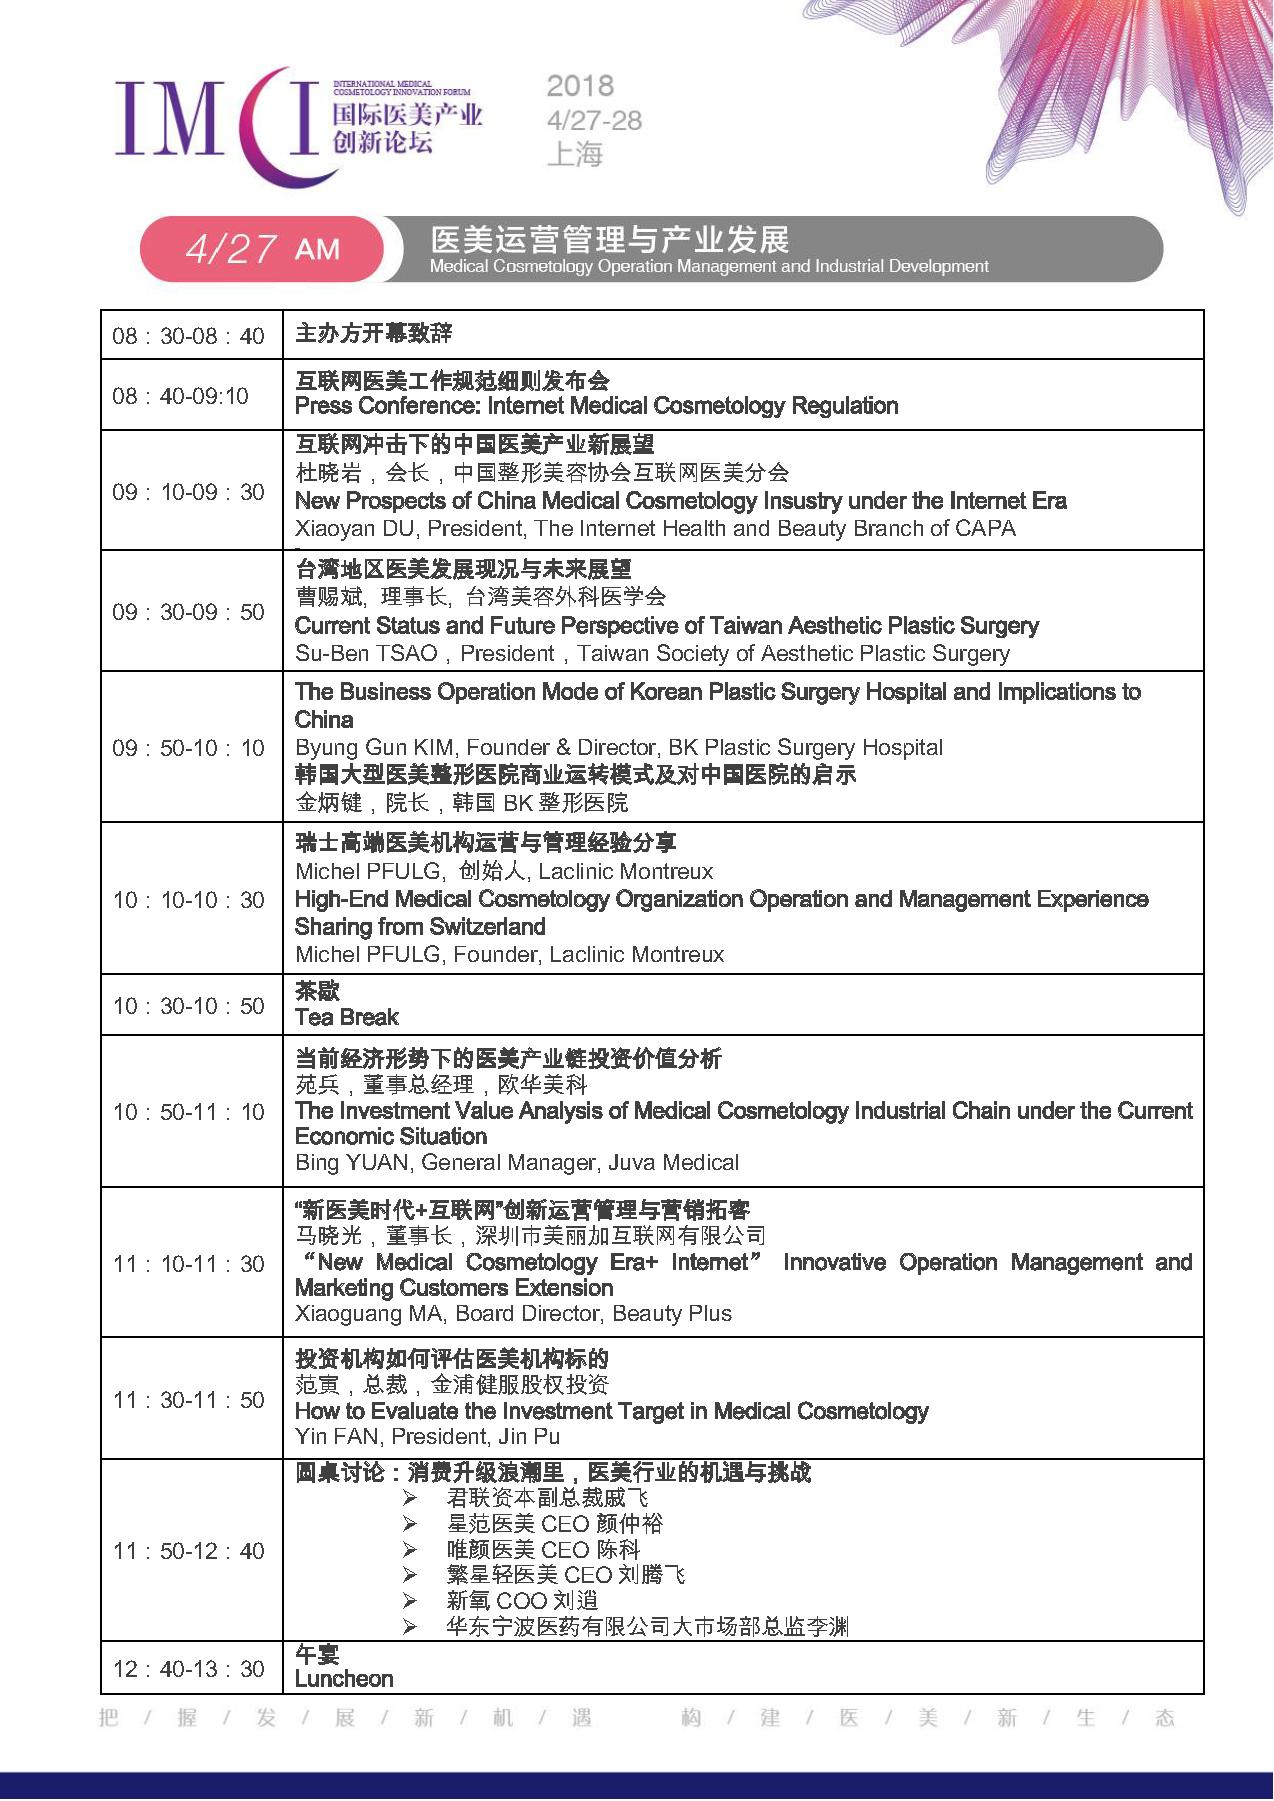 2018IMCI国际医美产业创新论坛